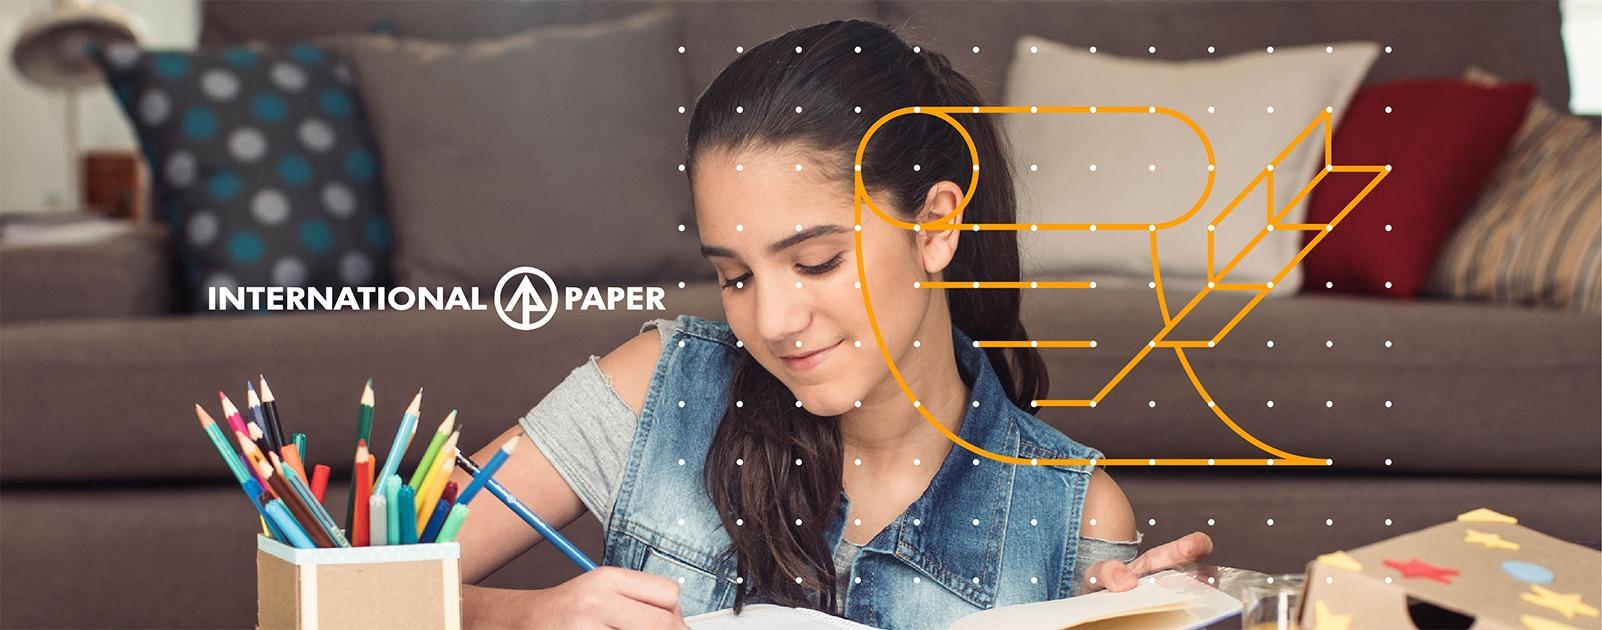 International Paper - Chamex